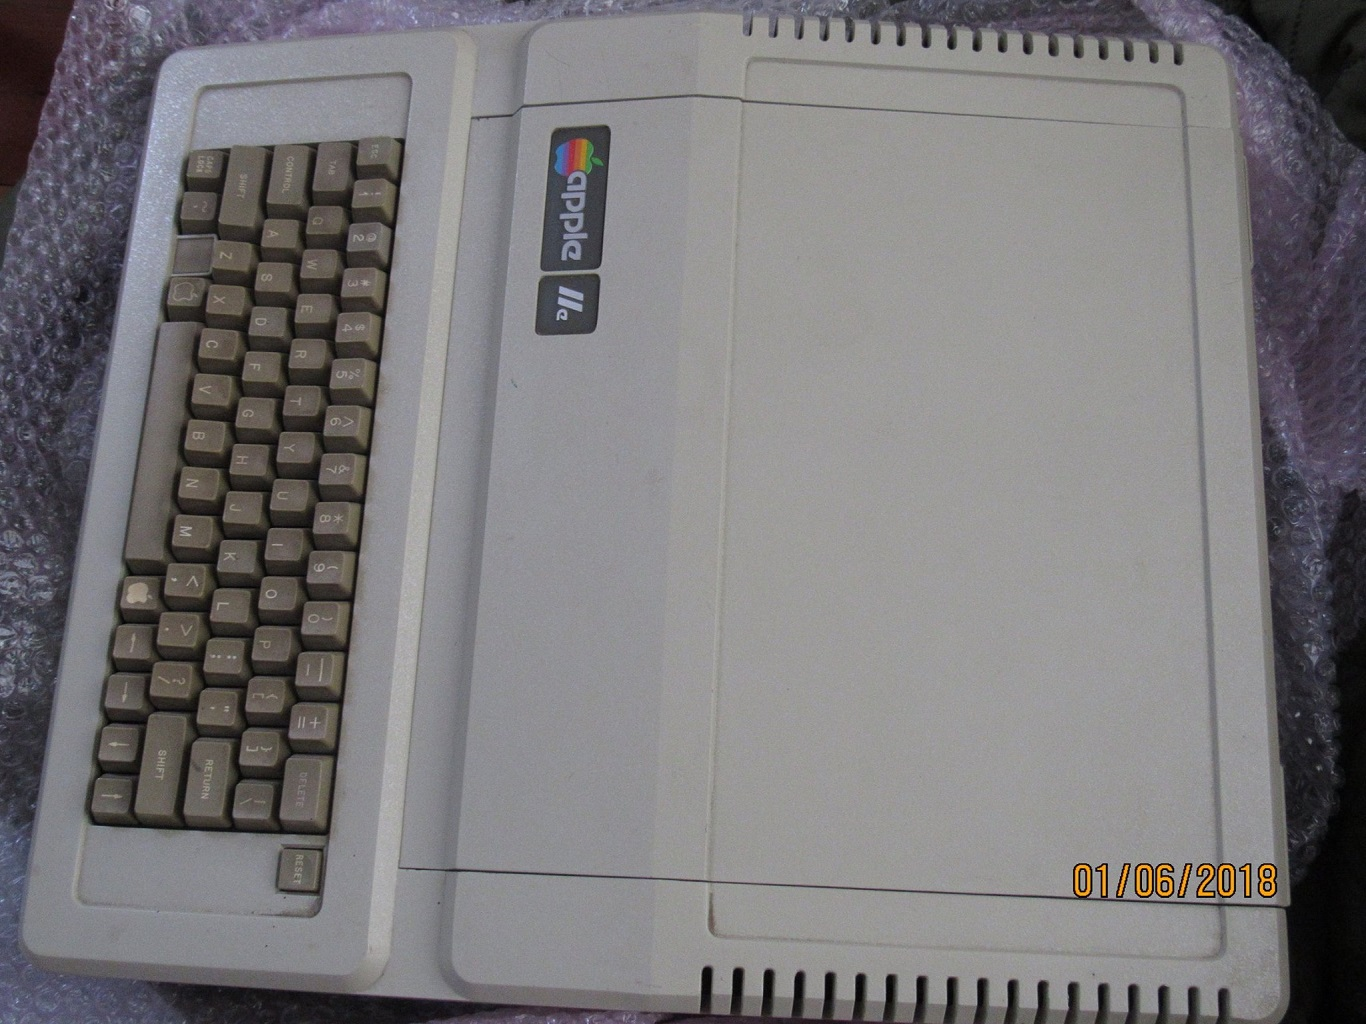 Apple IIe Pre-production - computer.jpg